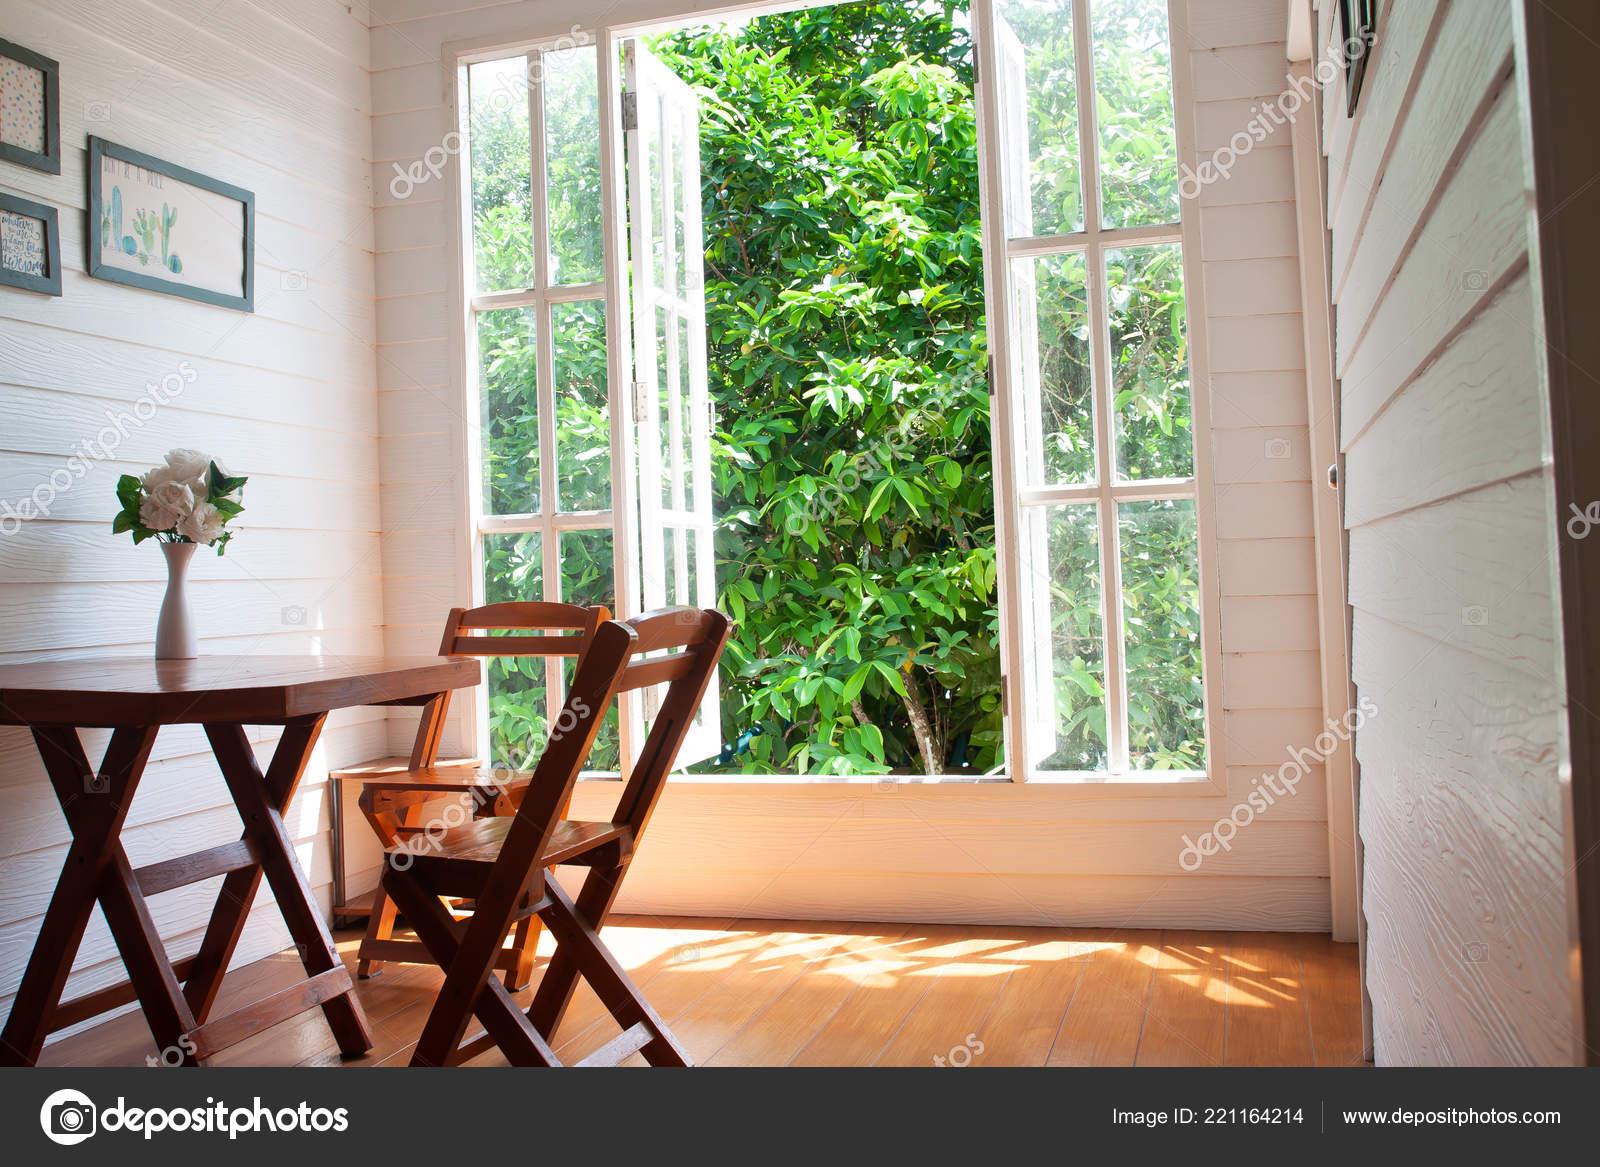 Living Room Big Window Garden View Country Style Wooden Furniture Stock Photo C Schantalao 221164214